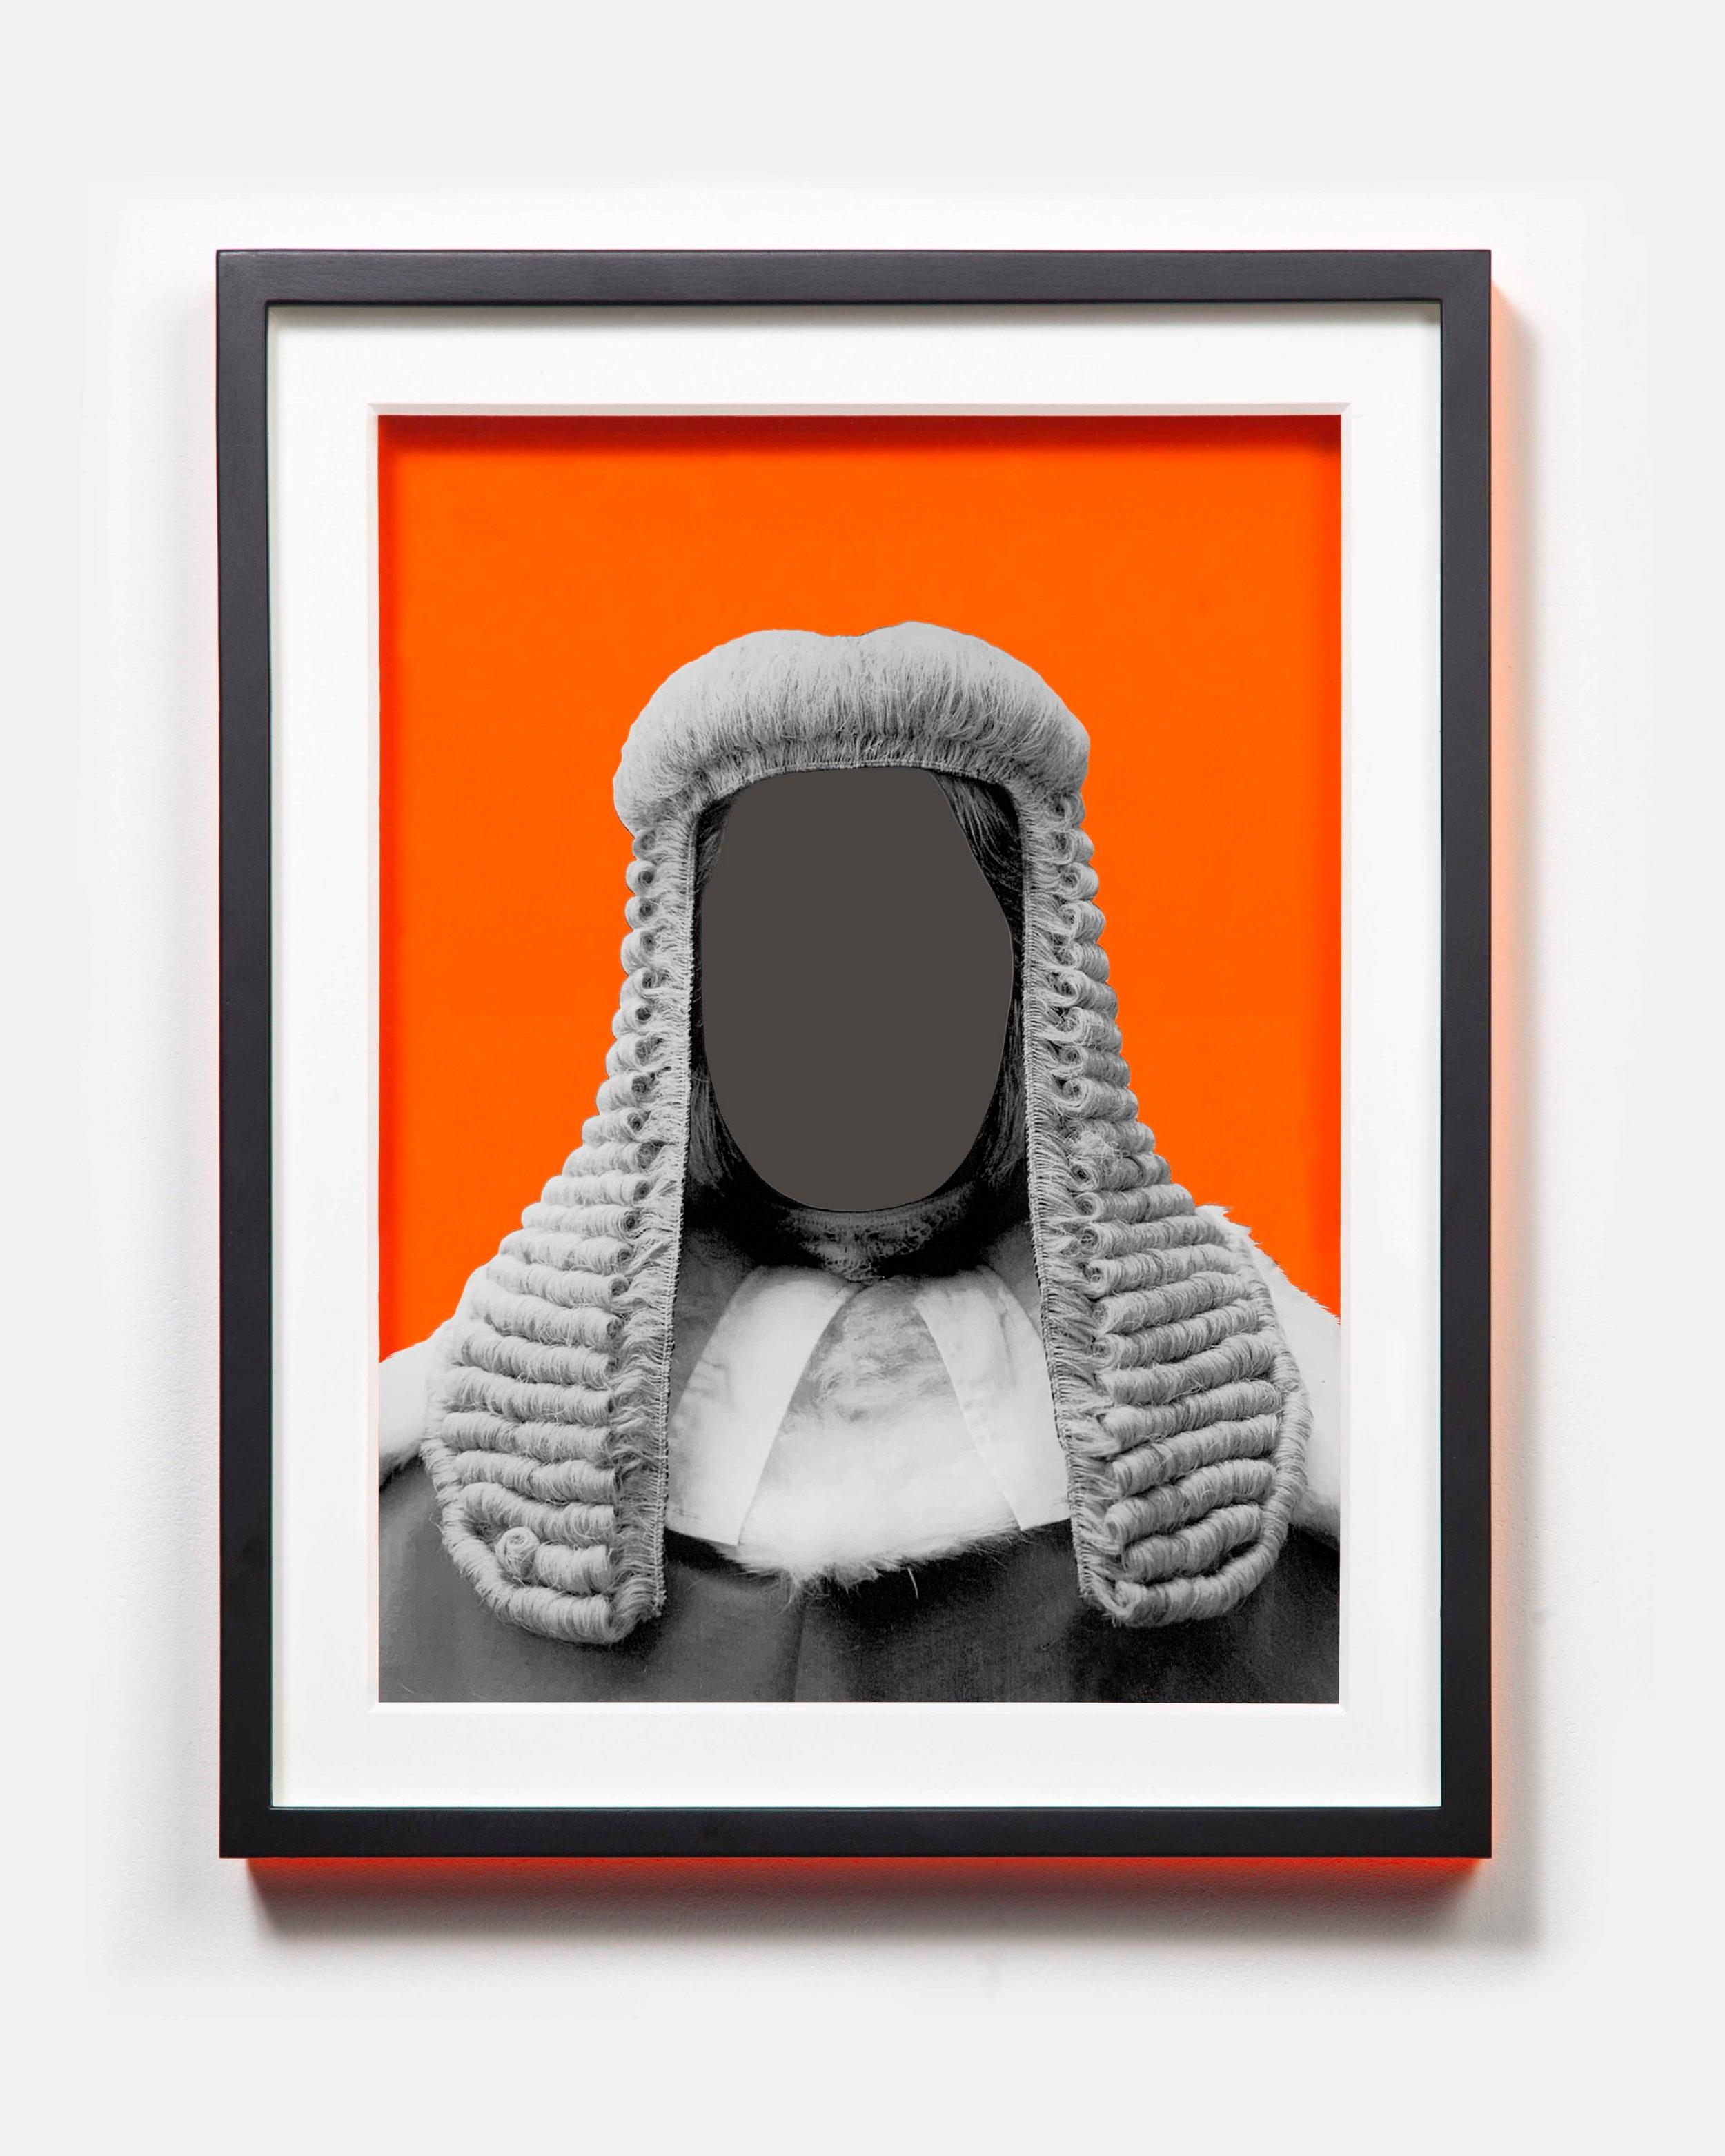 25.+Justice+Bobbie+Cheema-Grubb.jpg